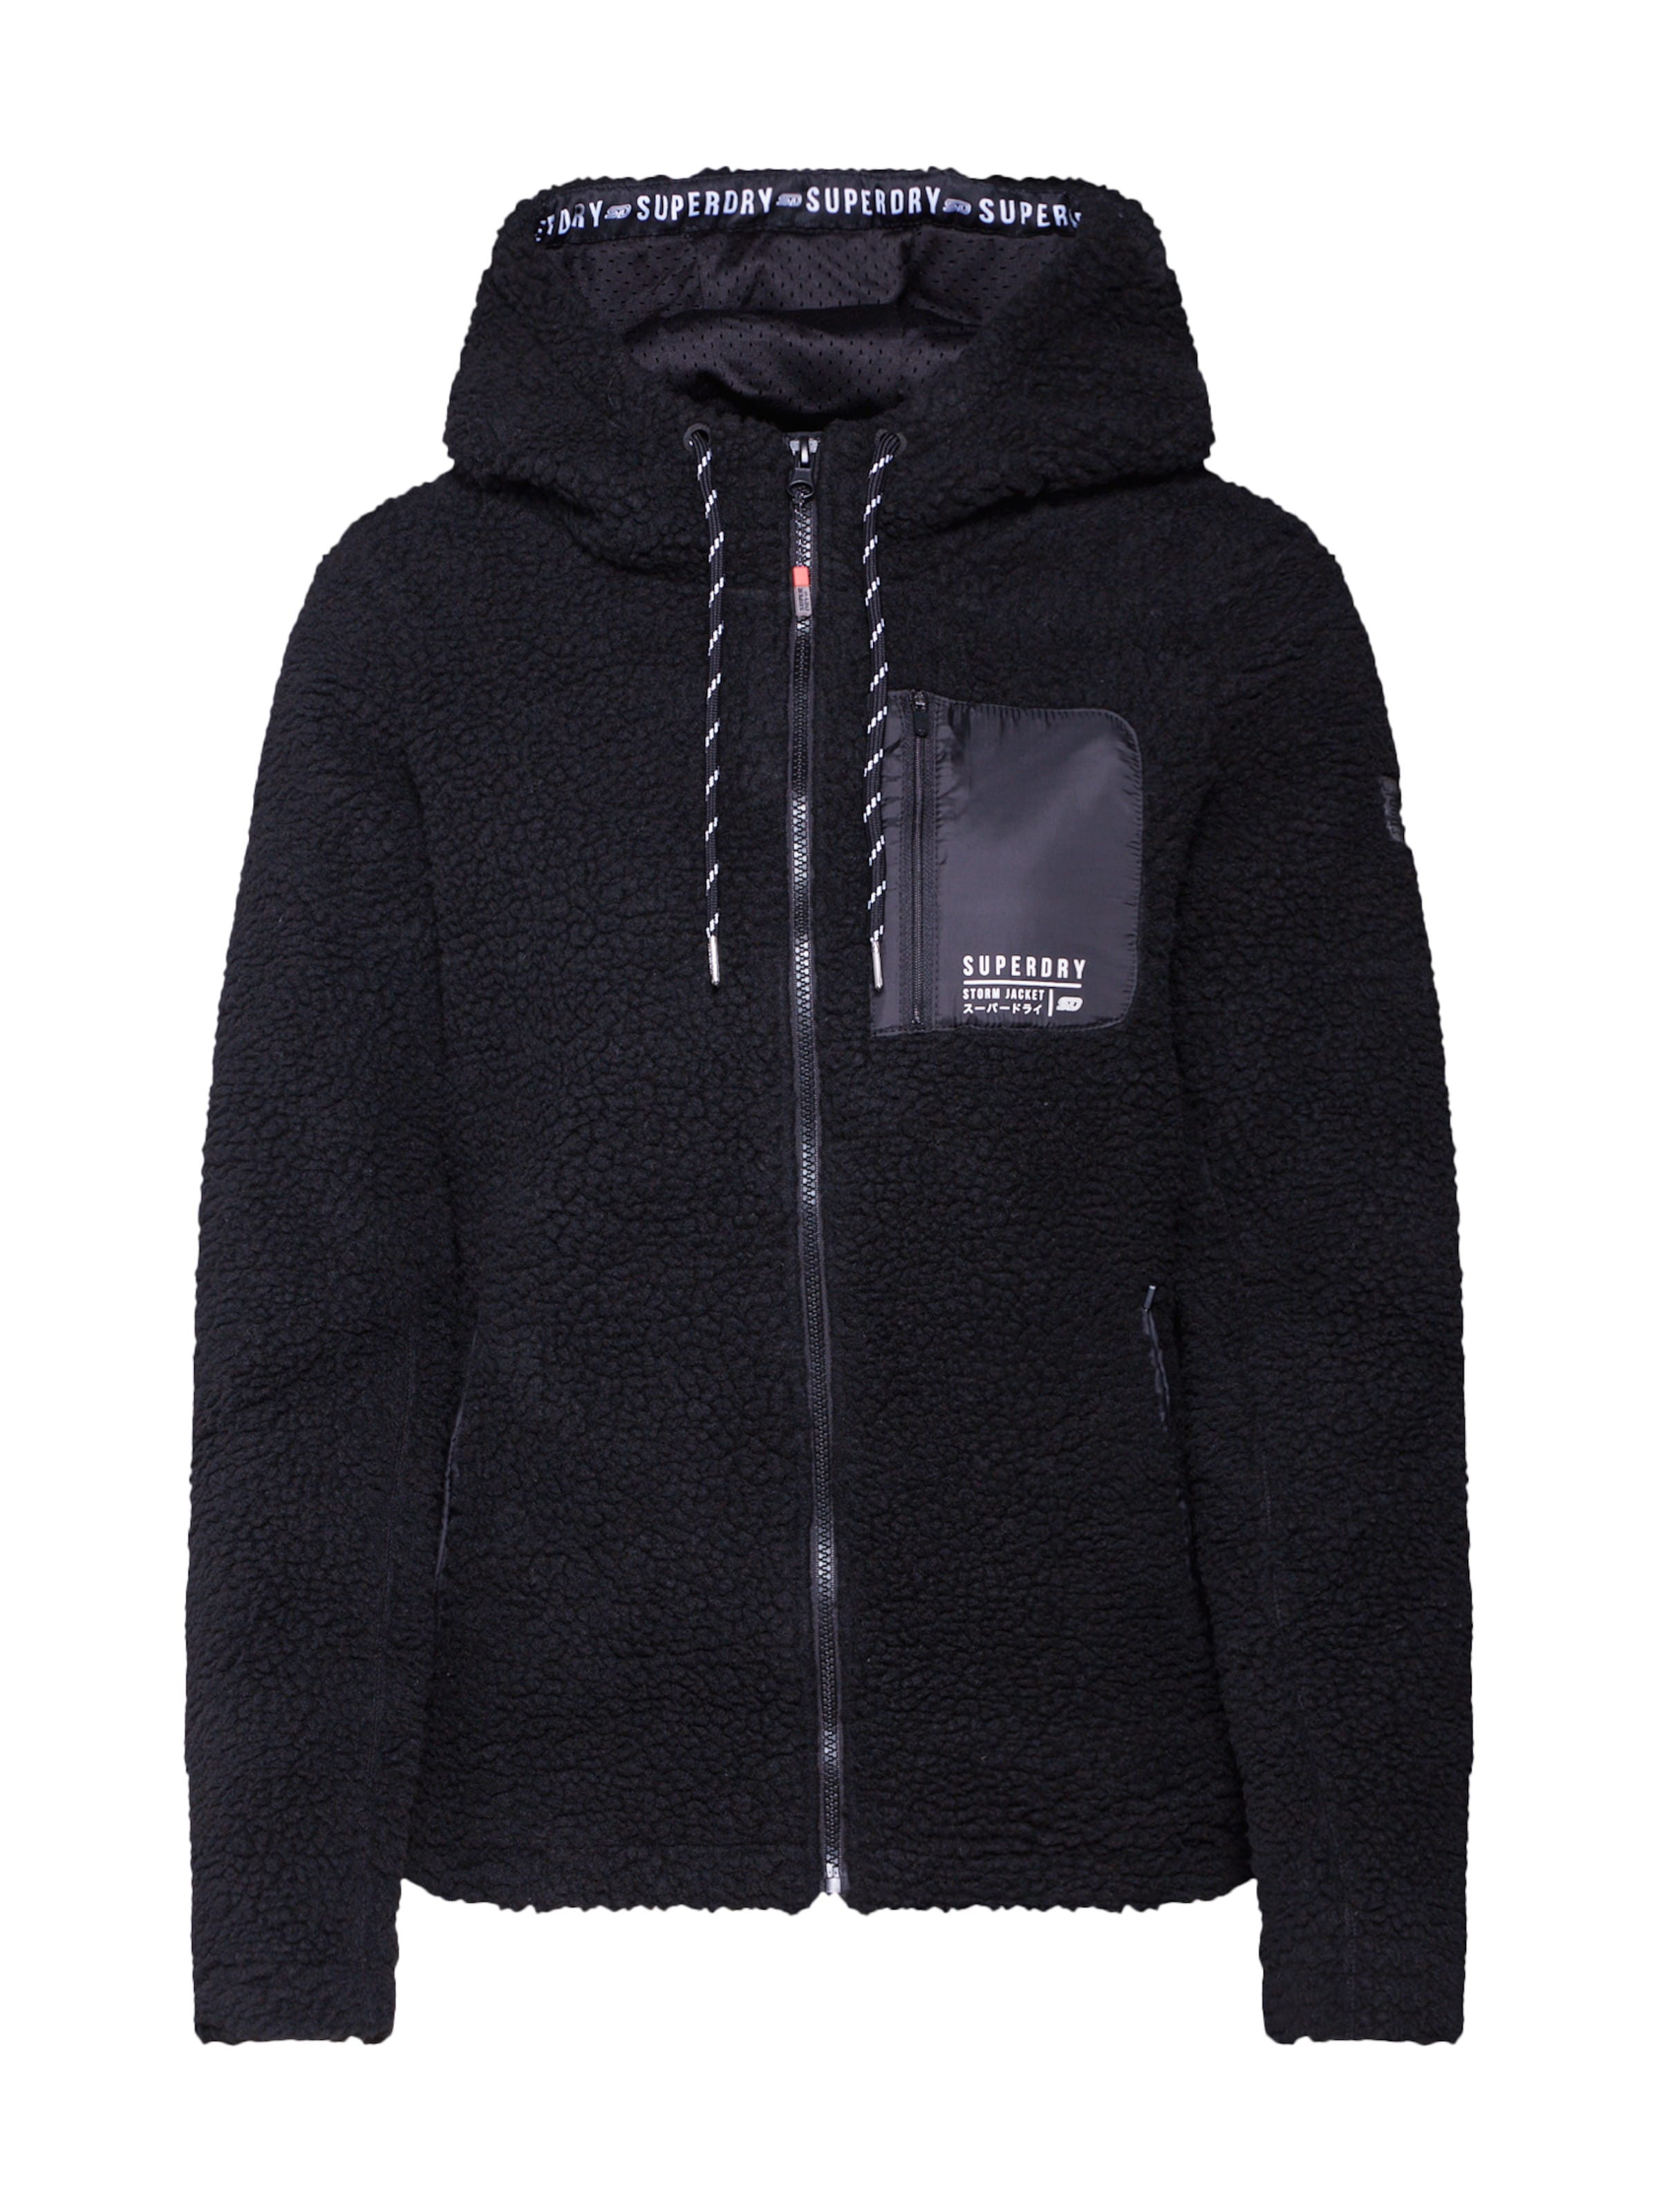 Noir shirt Ziphood' Urban 'storm En Sweat Superdry qVLGUzMpS